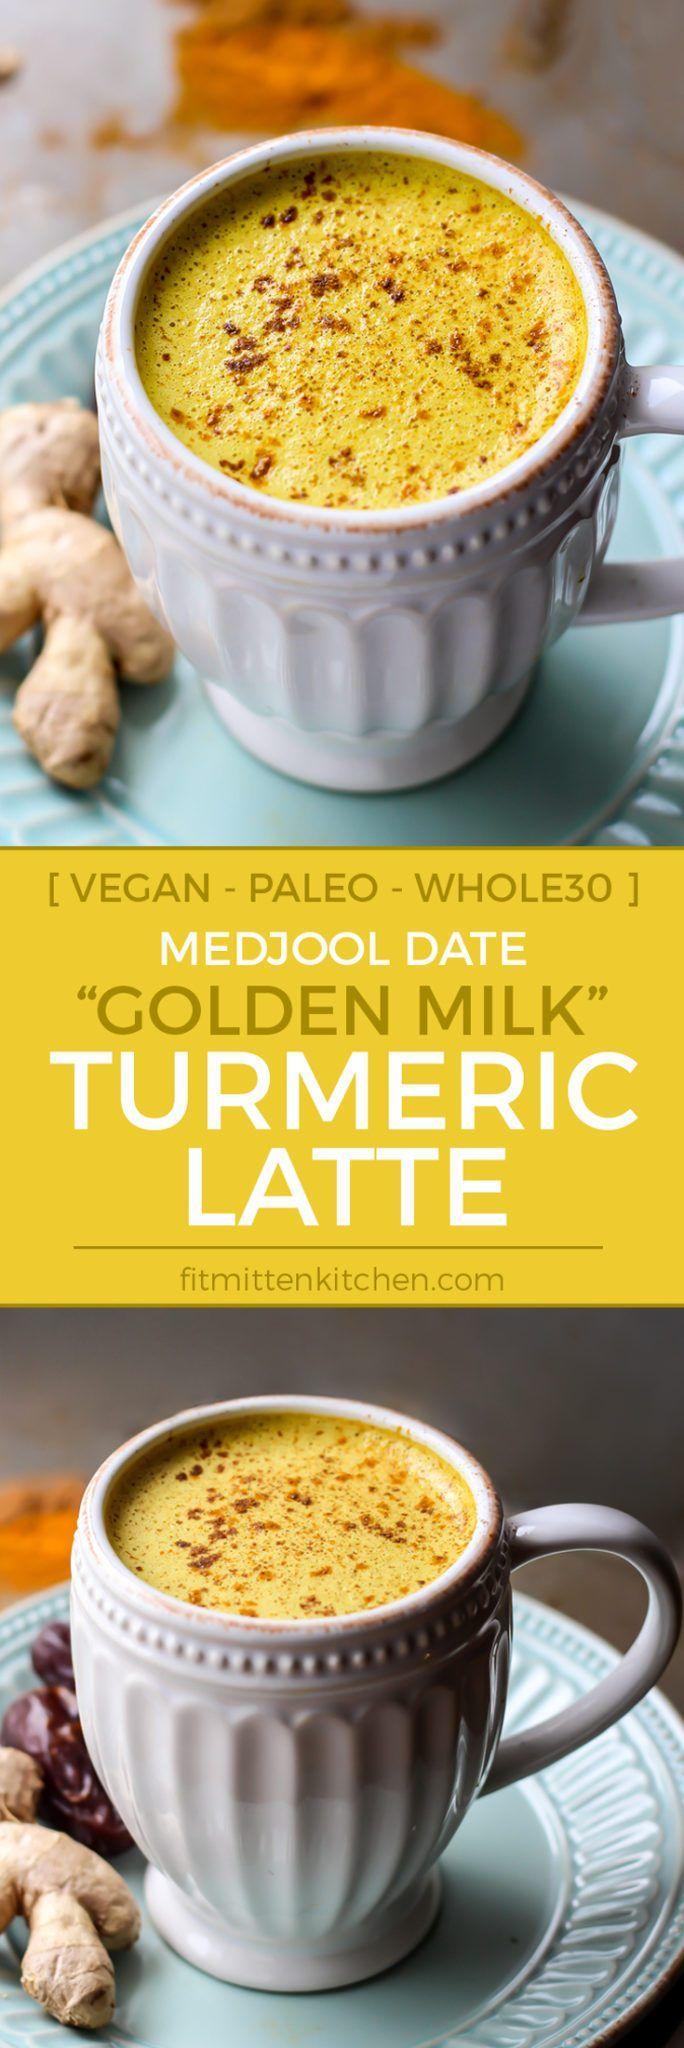 medjool date golden milk turmeric latte vegan whole30 rezept food inspiration. Black Bedroom Furniture Sets. Home Design Ideas